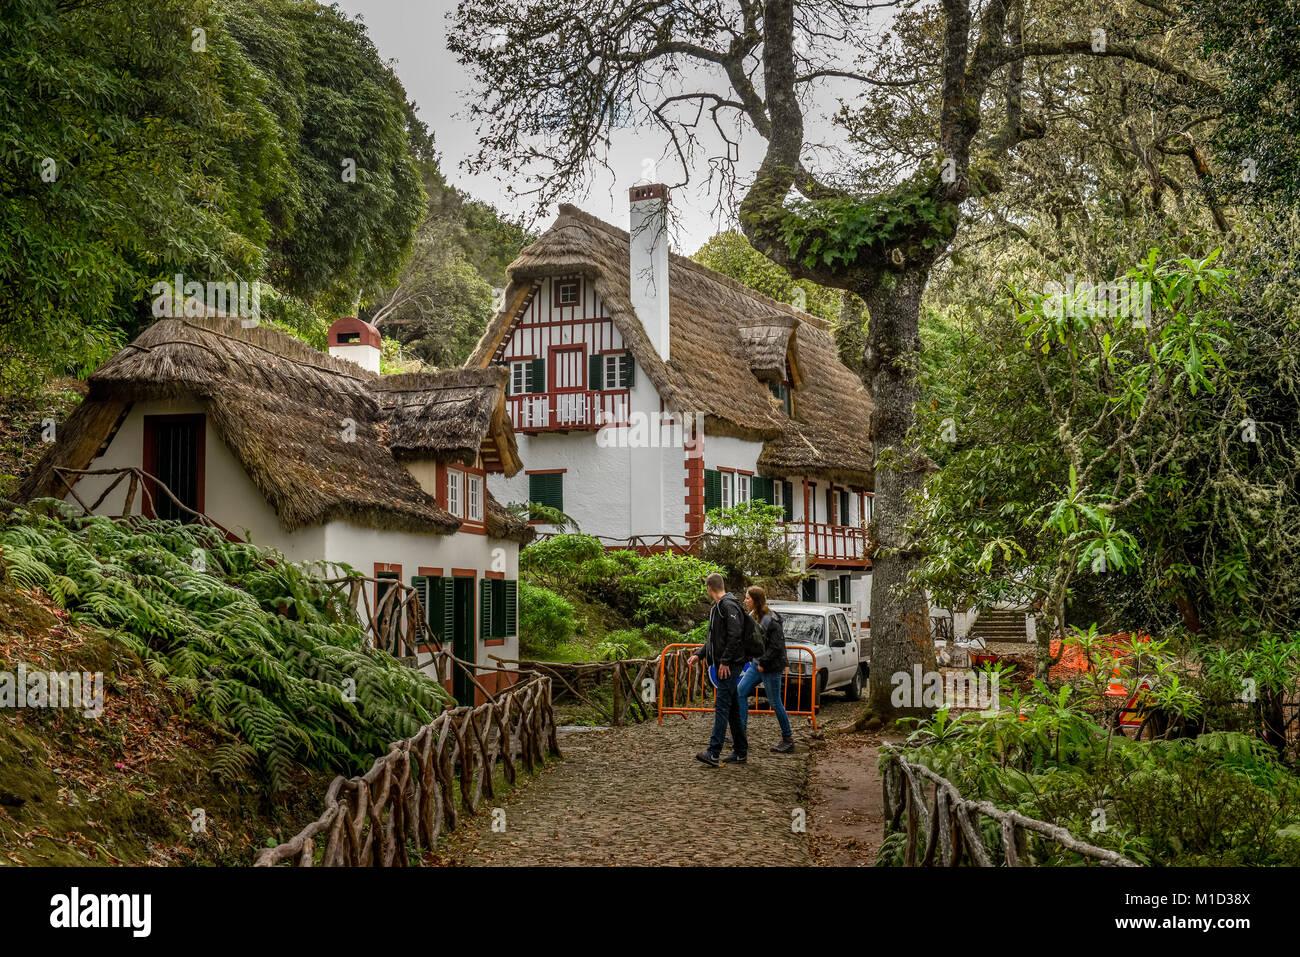 Forester's house QUEIMADAS, Central Mountains, Madeira, Portugal, Forsthaus, Queimadas, Zentralgebirge - Stock Image